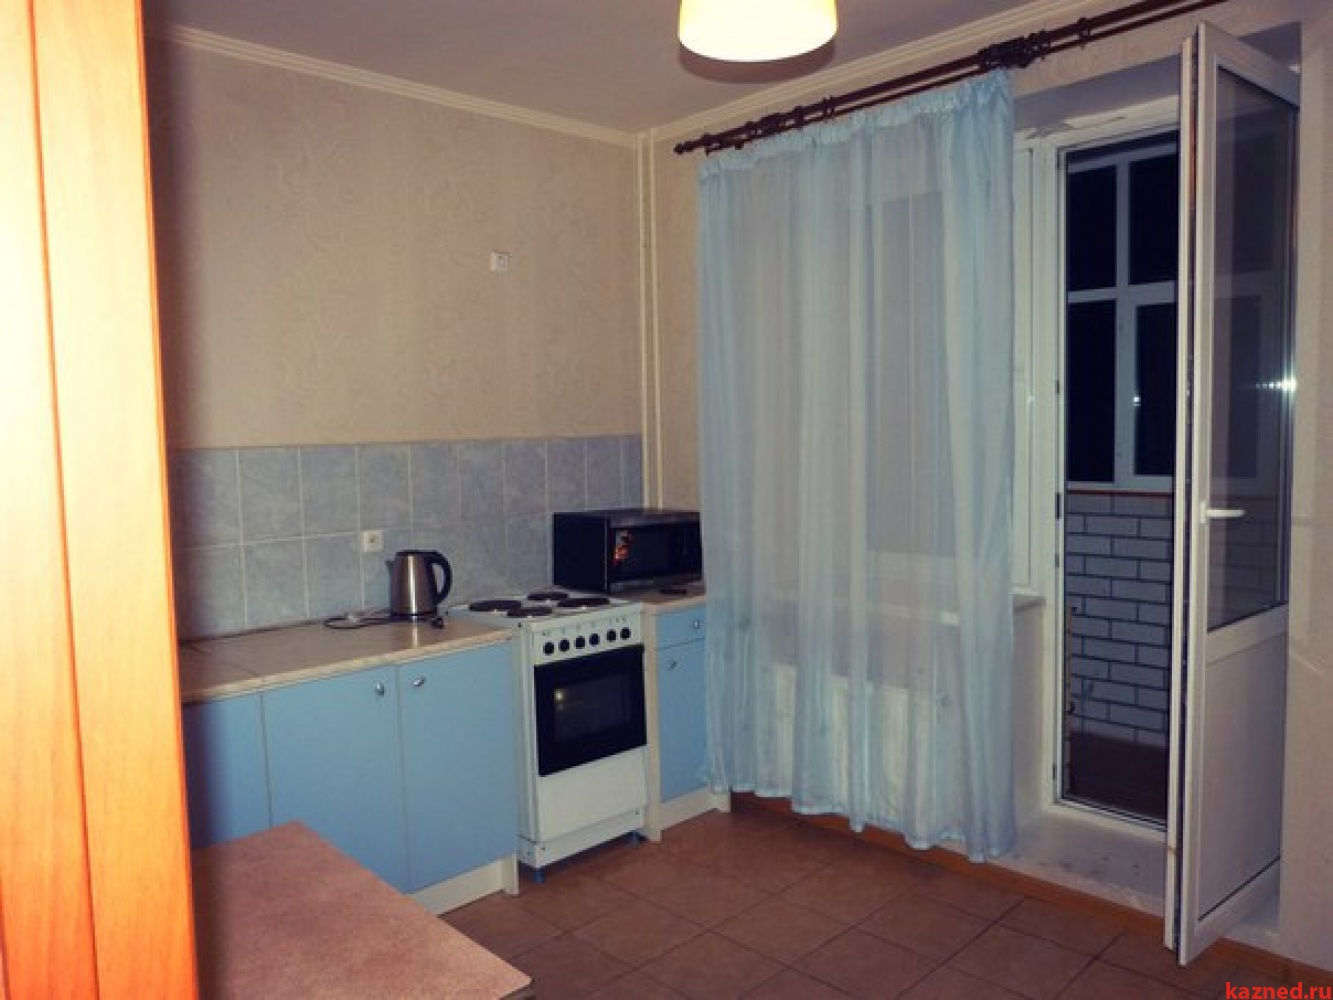 Продам 1-комн.квартиру Маршала Чуйкова 62, 39 м2  (миниатюра №1)